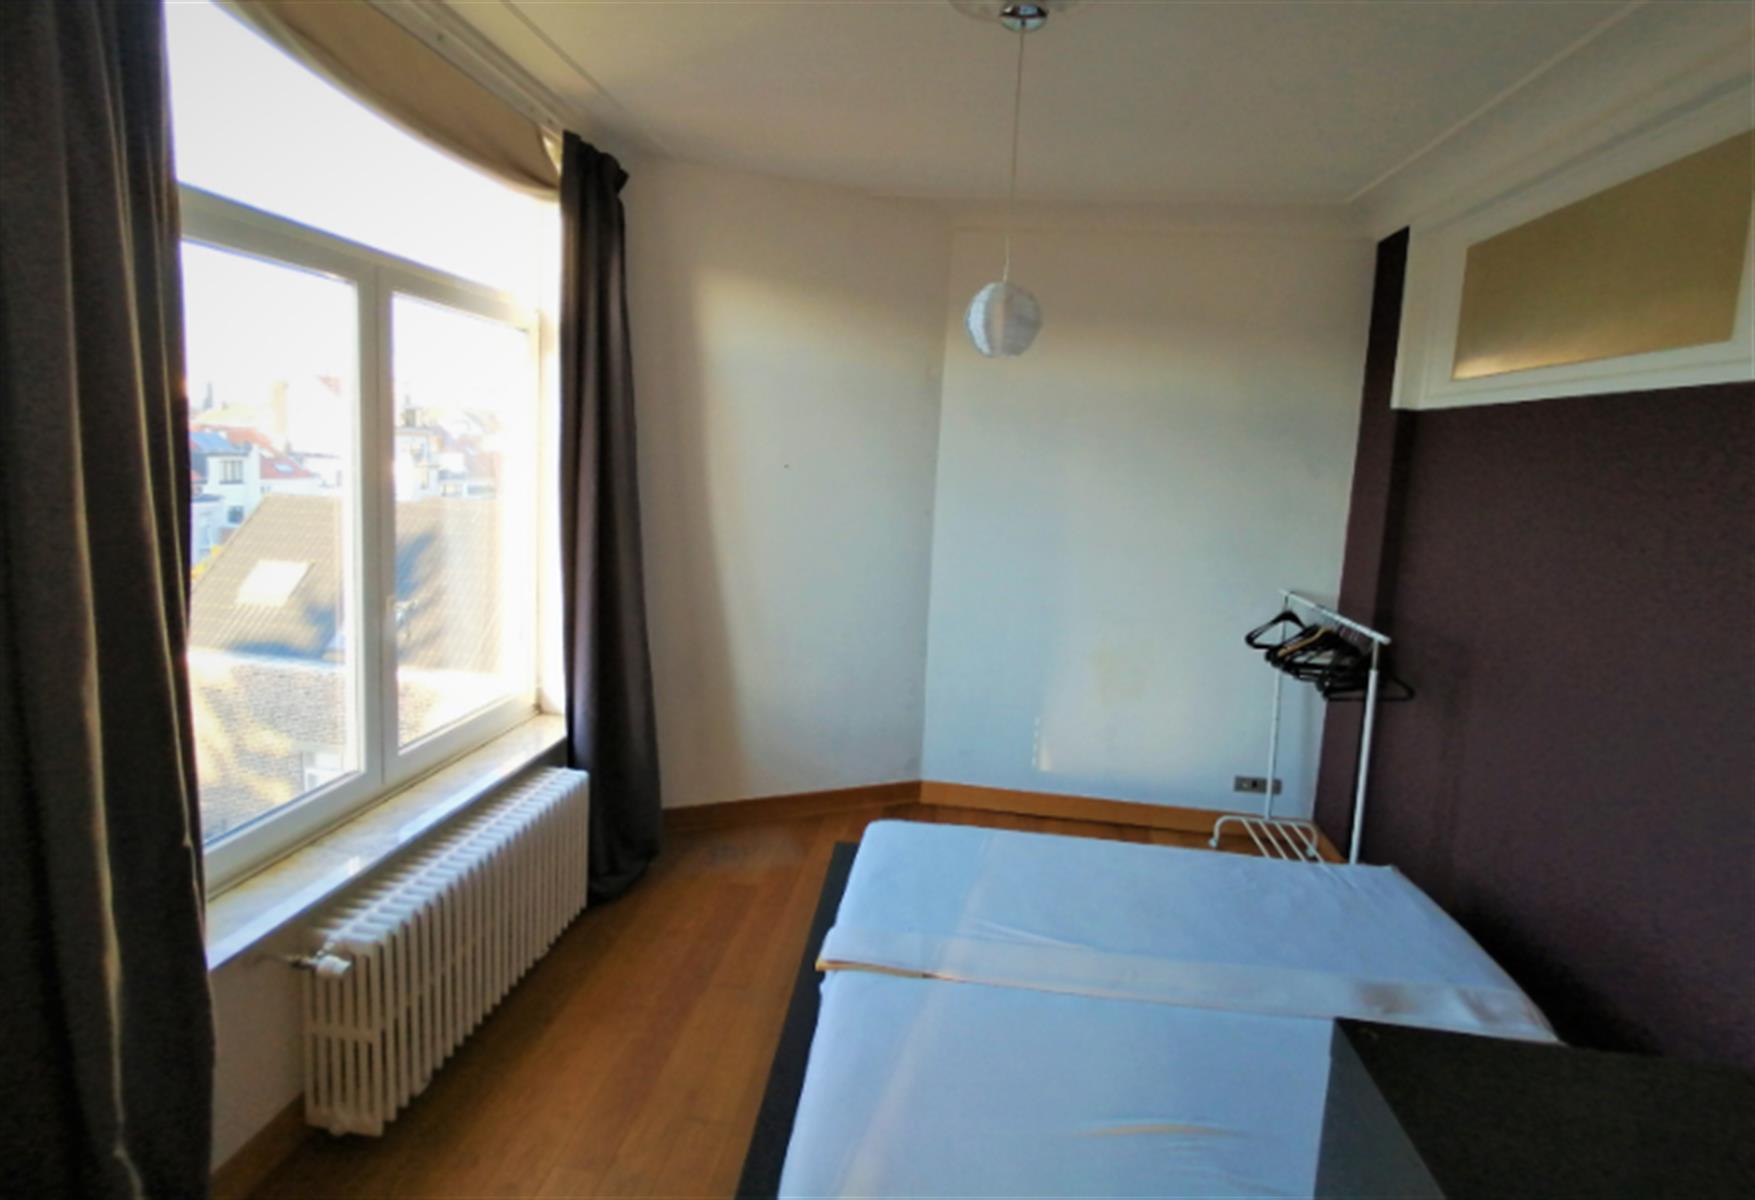 Appartement - Woluwe-Saint-Lambert - #4106440-5